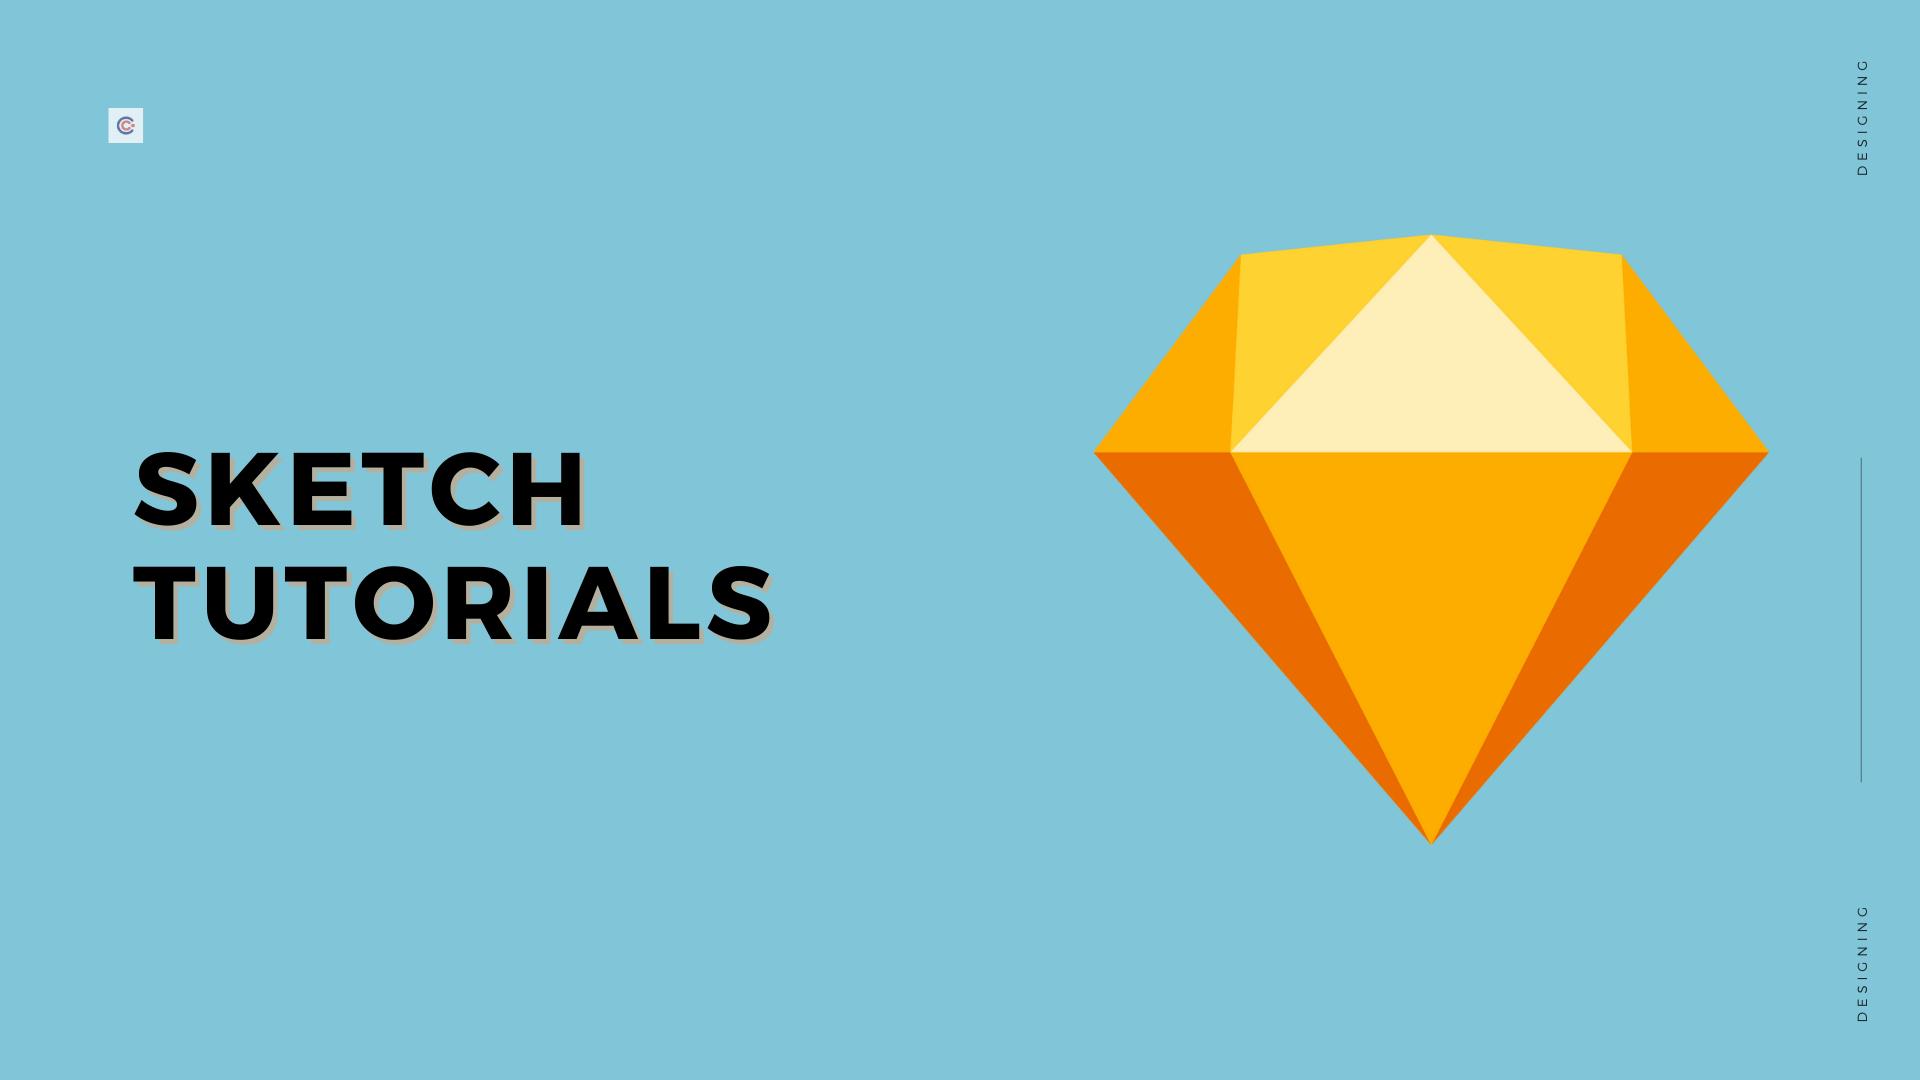 7 Best Sketch App Tutorials - Learn Sketch Online